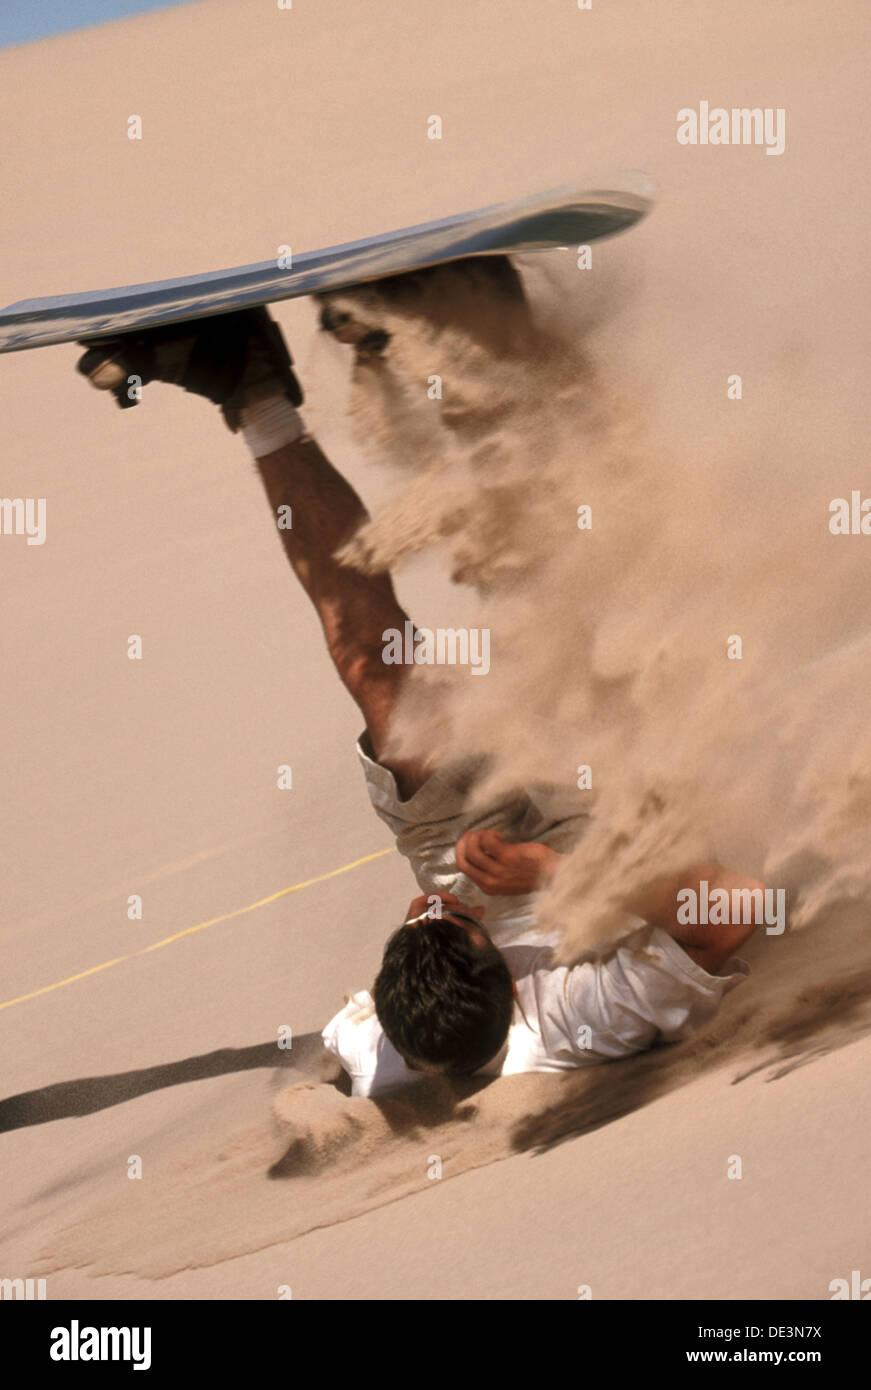 Backside slide spewing sand at Dumont Dunes. California. USA. - Stock Image